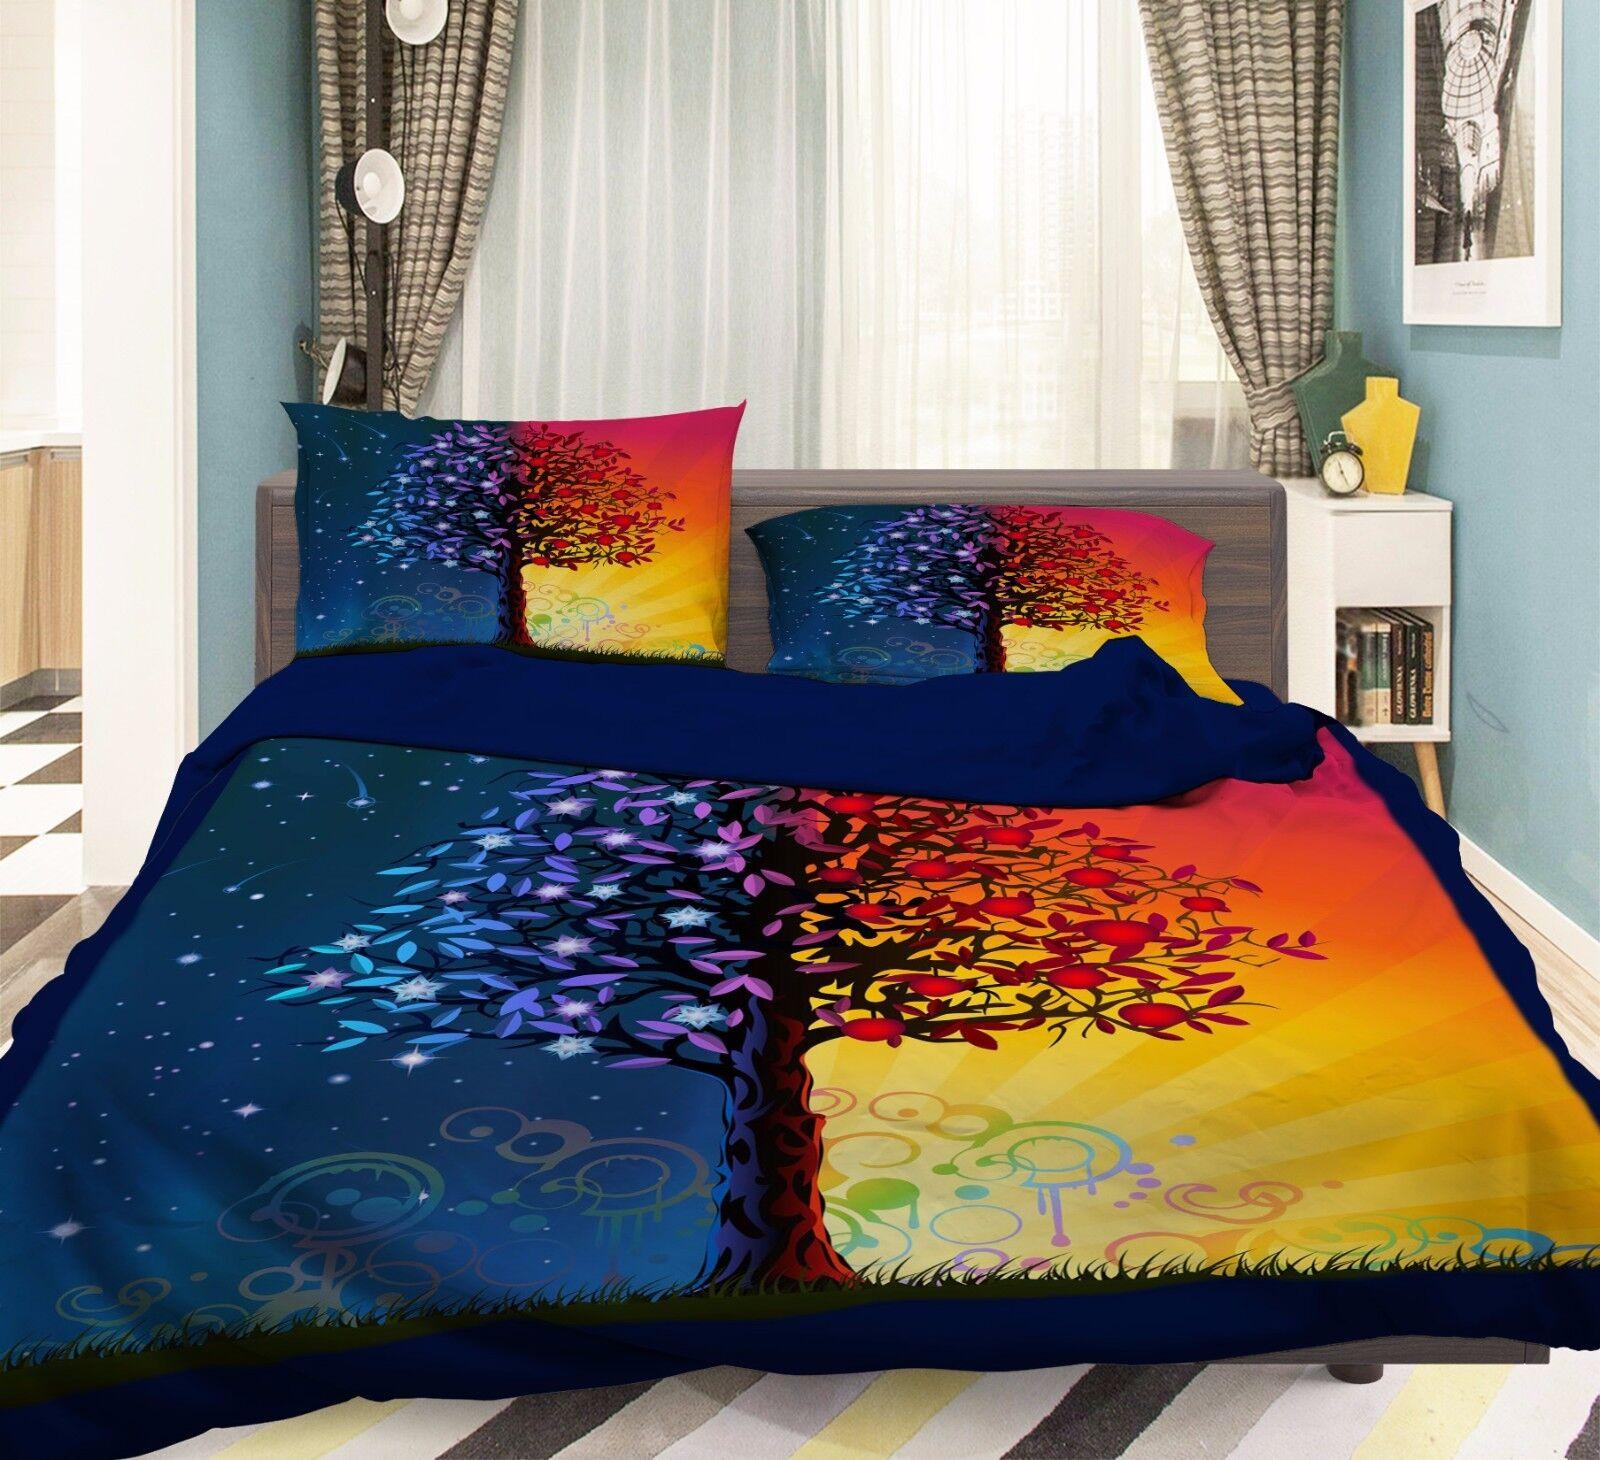 3D Tree Sky 806 Bed Pillowcases Quilt Duvet Cover Set Single Queen UK Summer